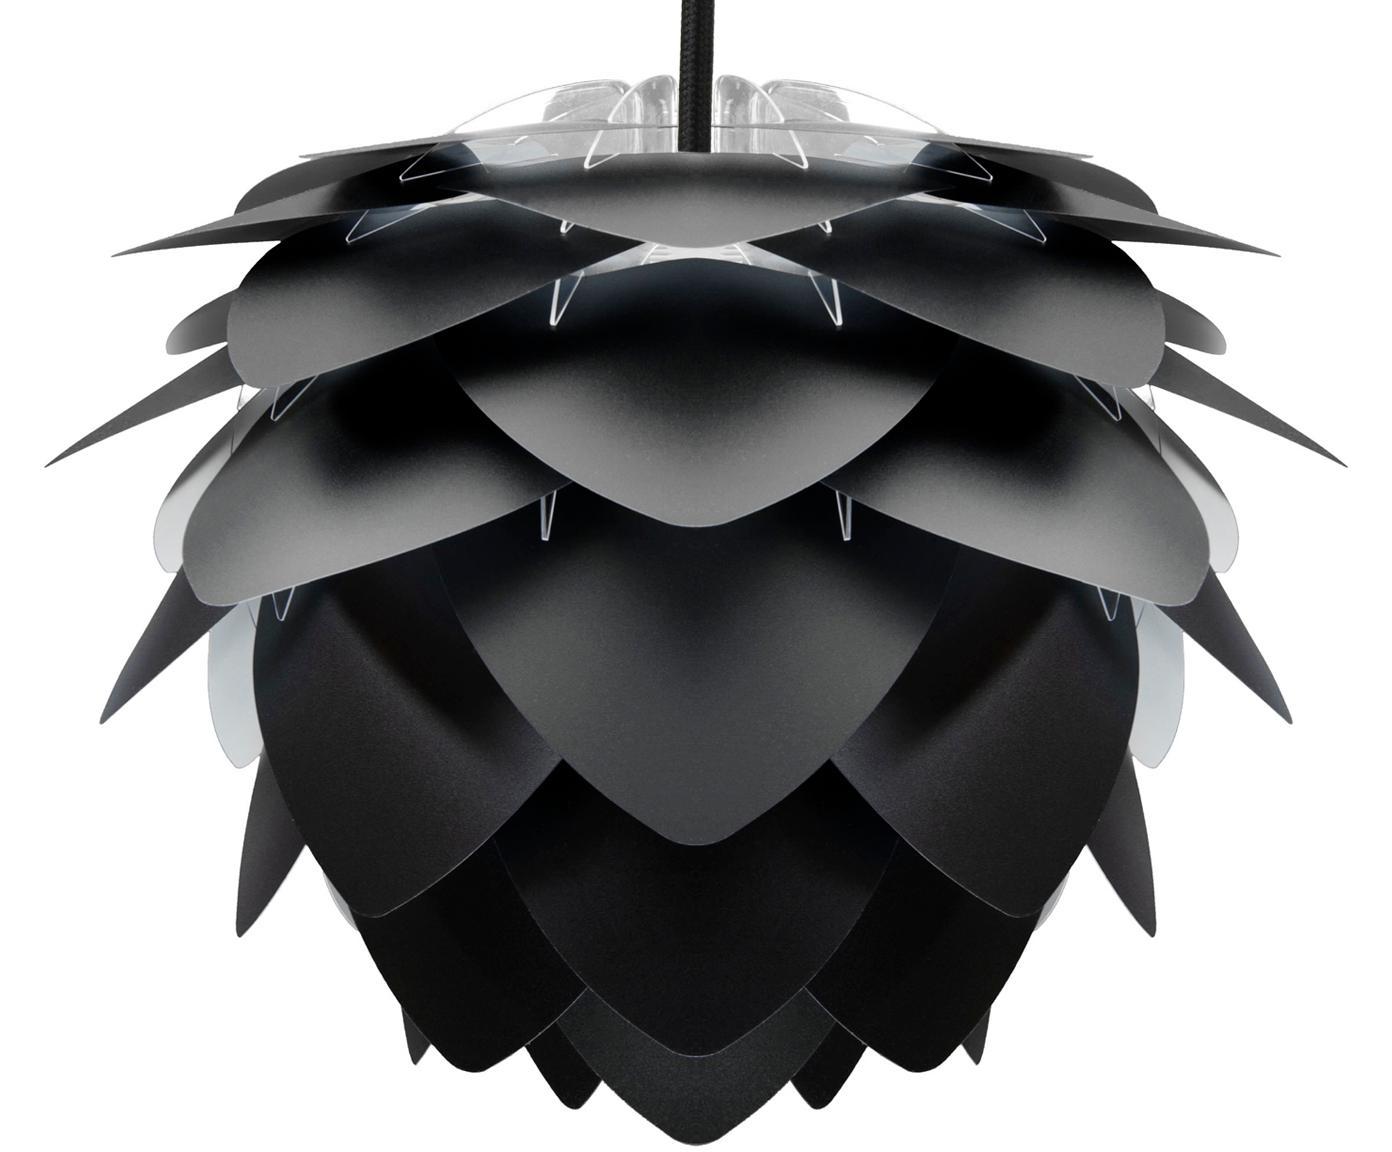 Pendelleuchte Silvia, Bausatz, Lampenschirm: Polypropylen, Schwarz, Ø 32 x H 25 cm